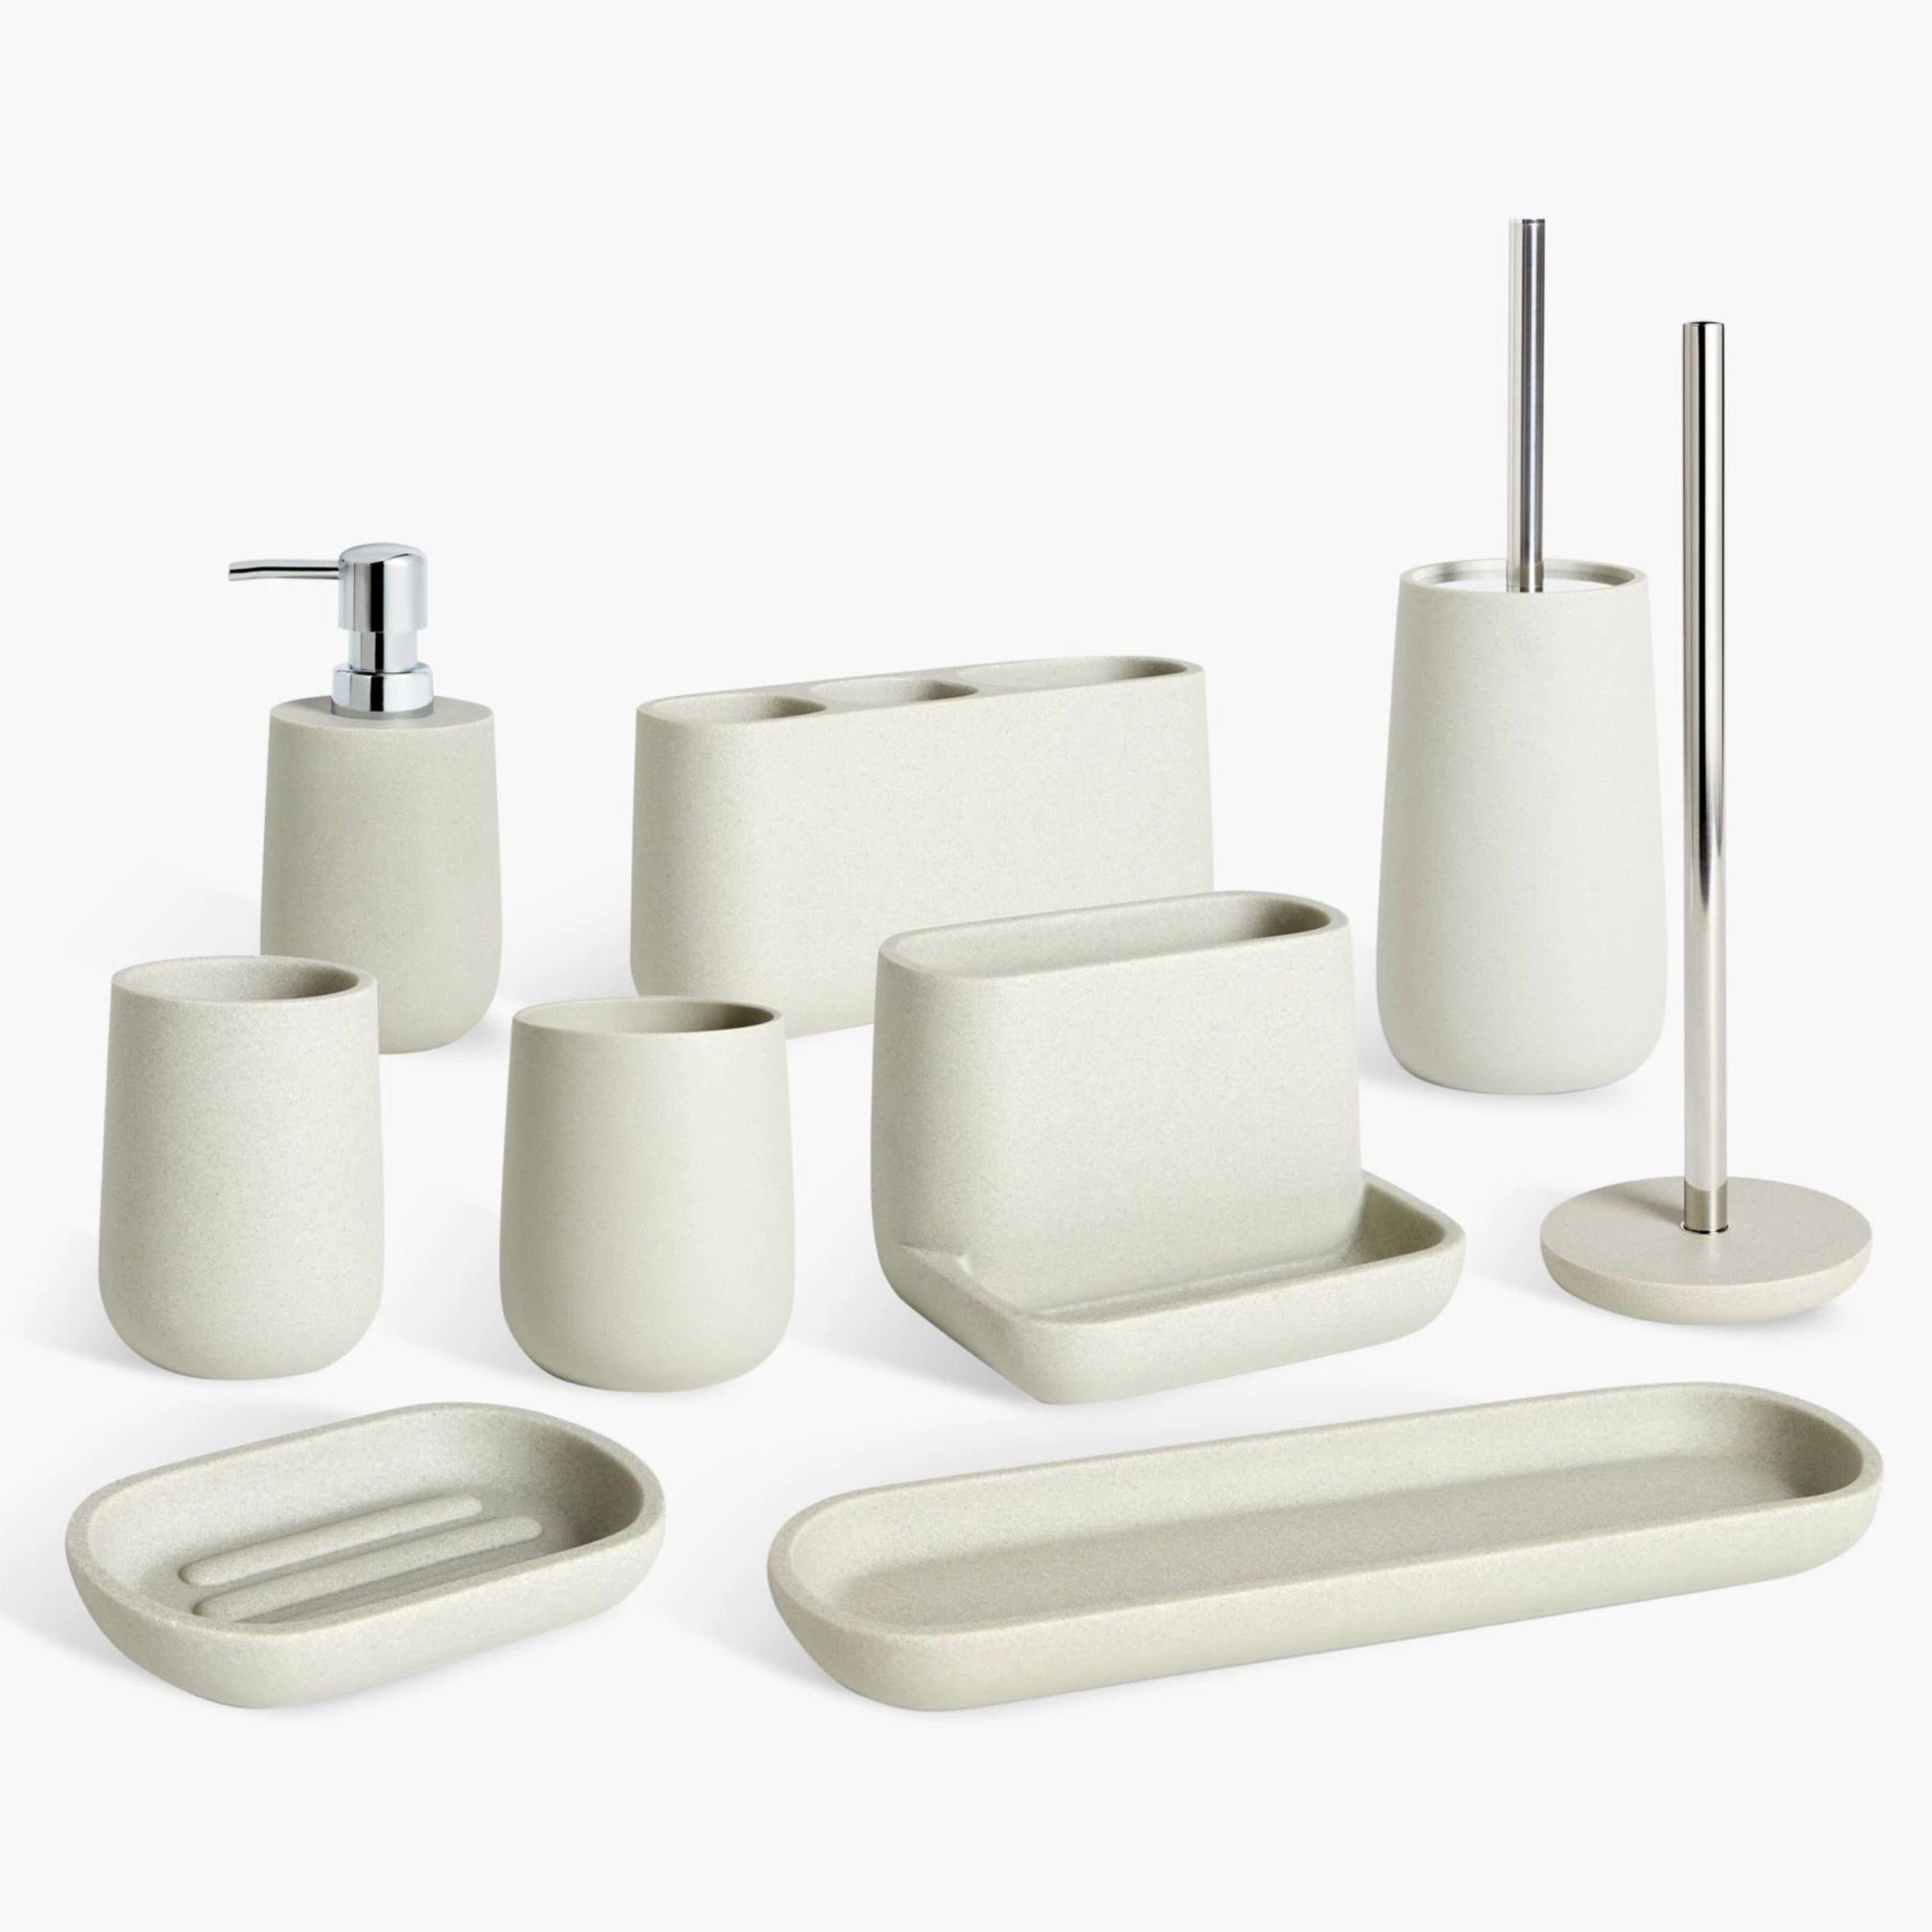 Bathroom Utensils Stock Vector Royalty Free 90807824